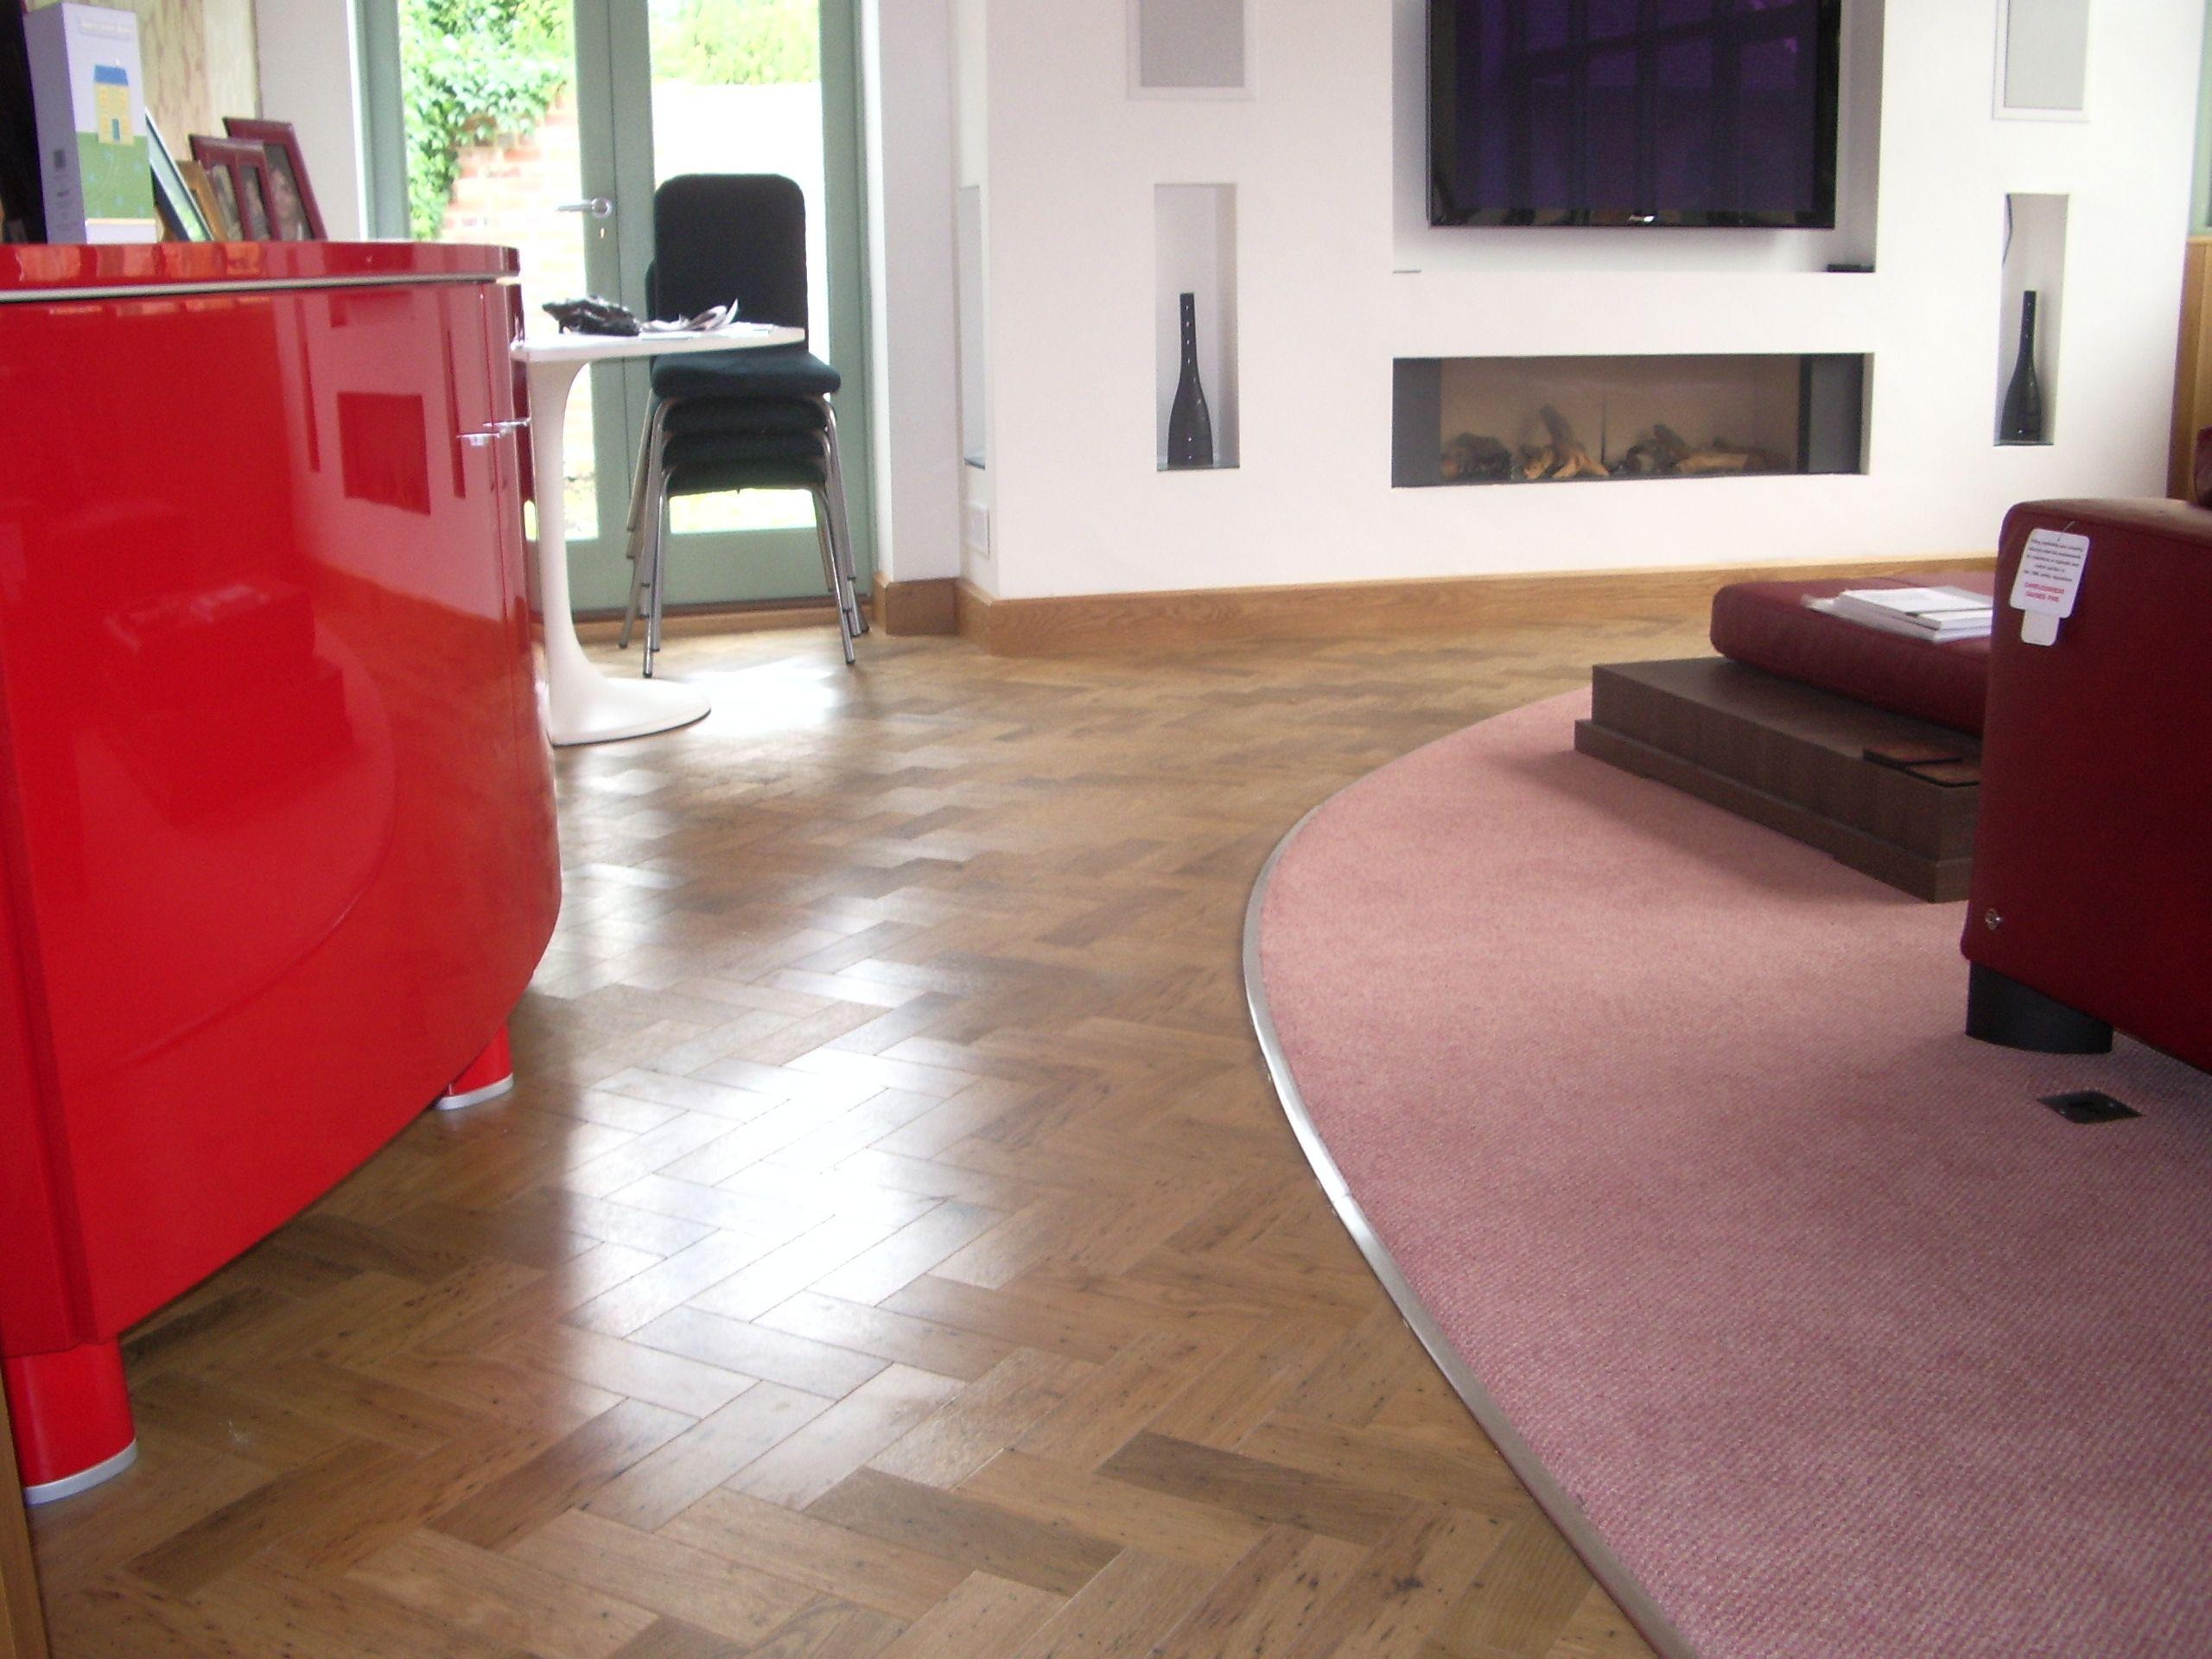 highmoon and nongzi co l flooring carpet floor